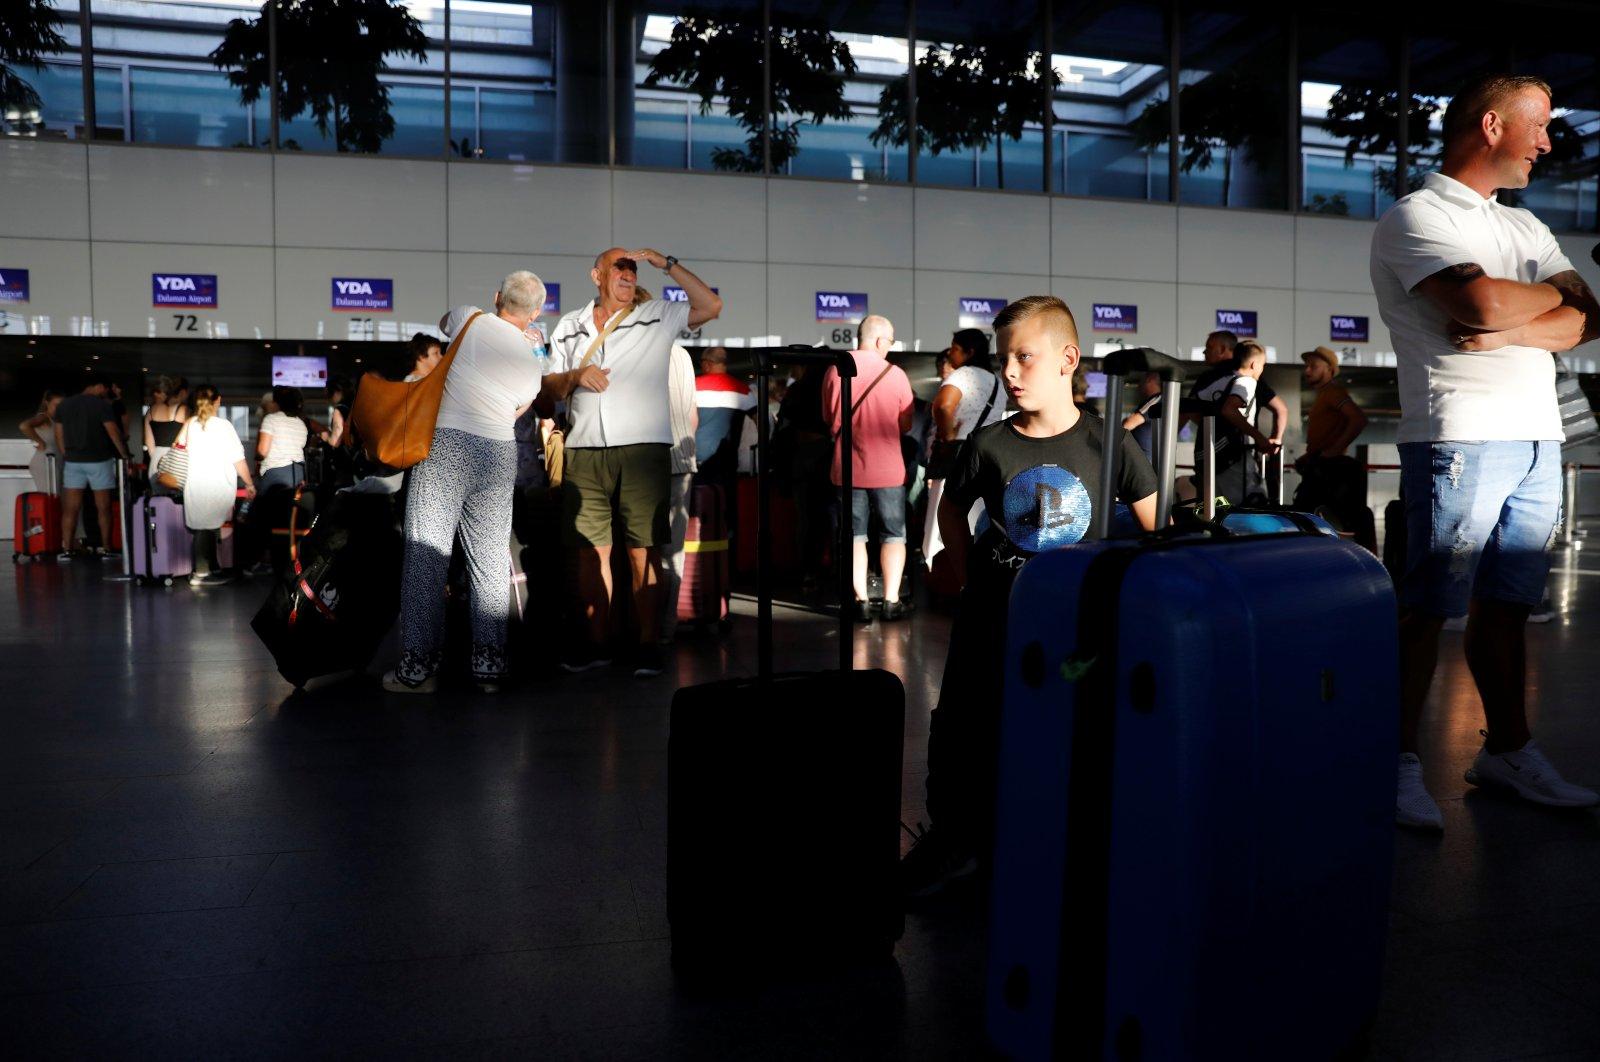 British tourists wait at Dalaman Airport in the southwestern province of Muğla, Turkey, Sept. 23, 2019. (Reuters Photo)